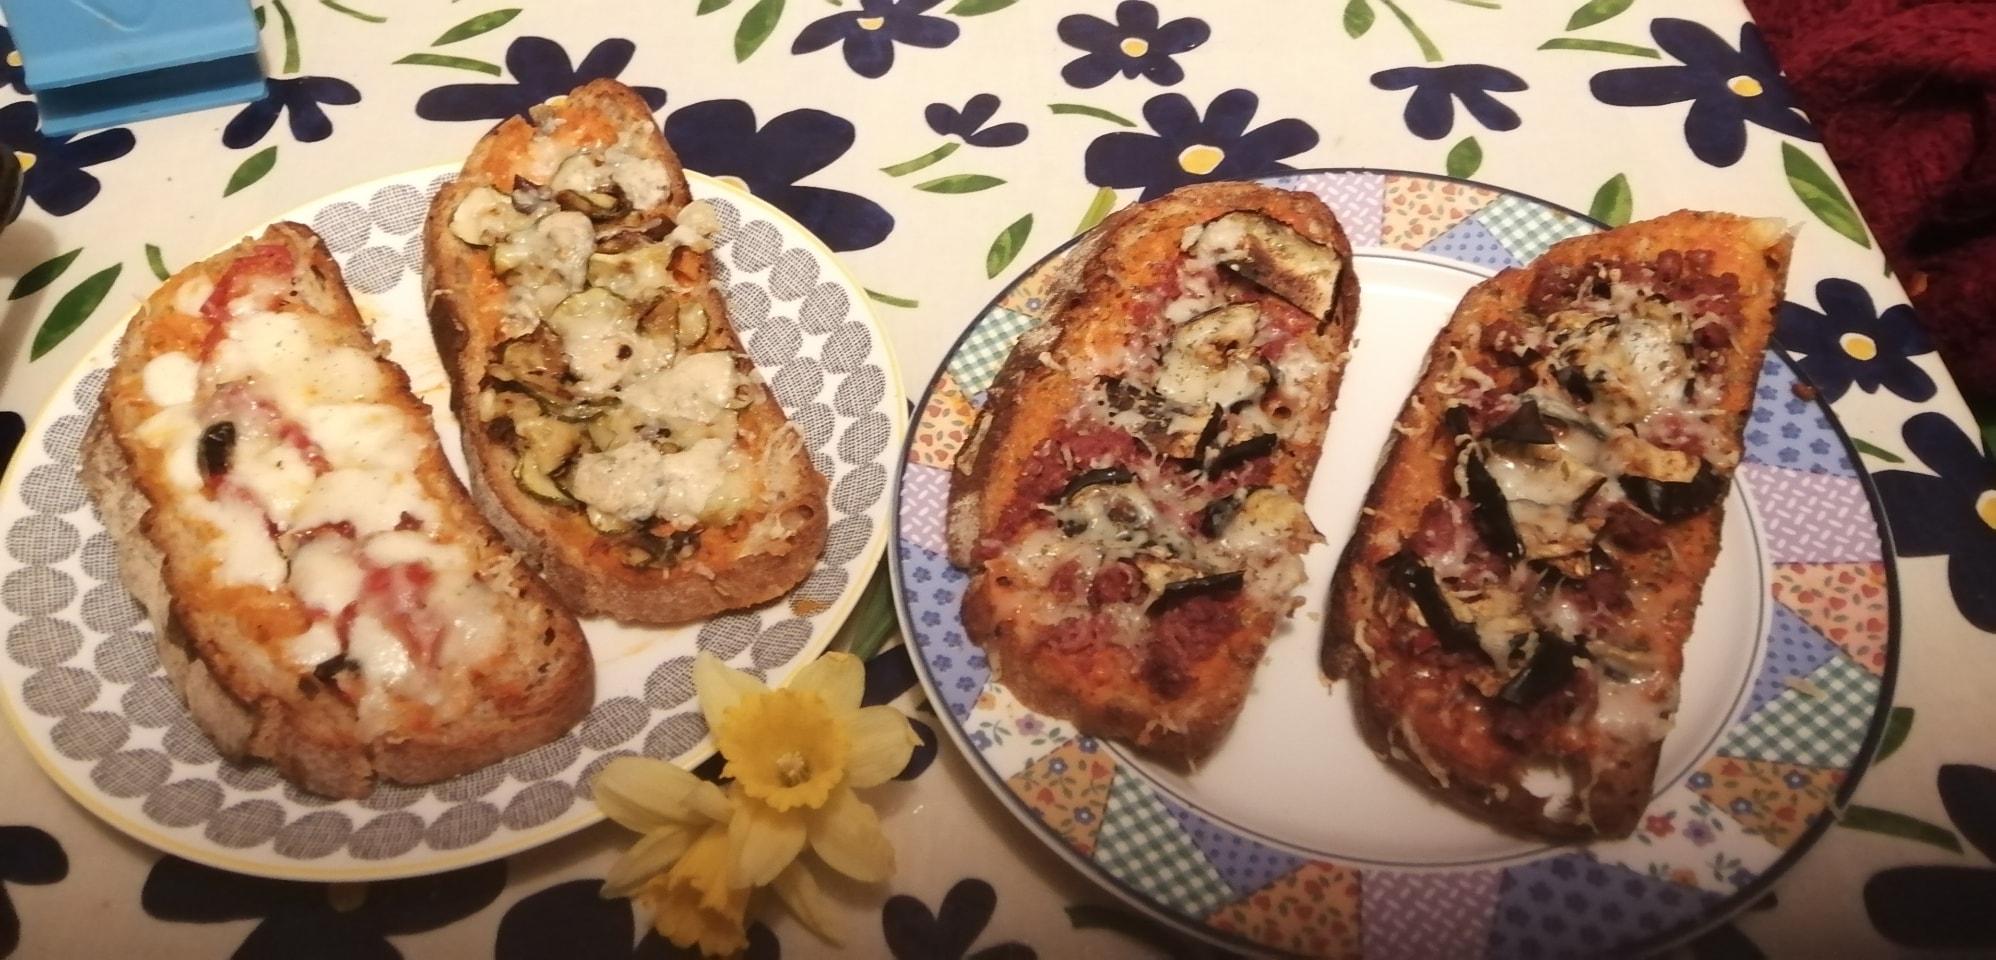 Bruschettas - with Provola cheese donated by Va Pensiero Lounge